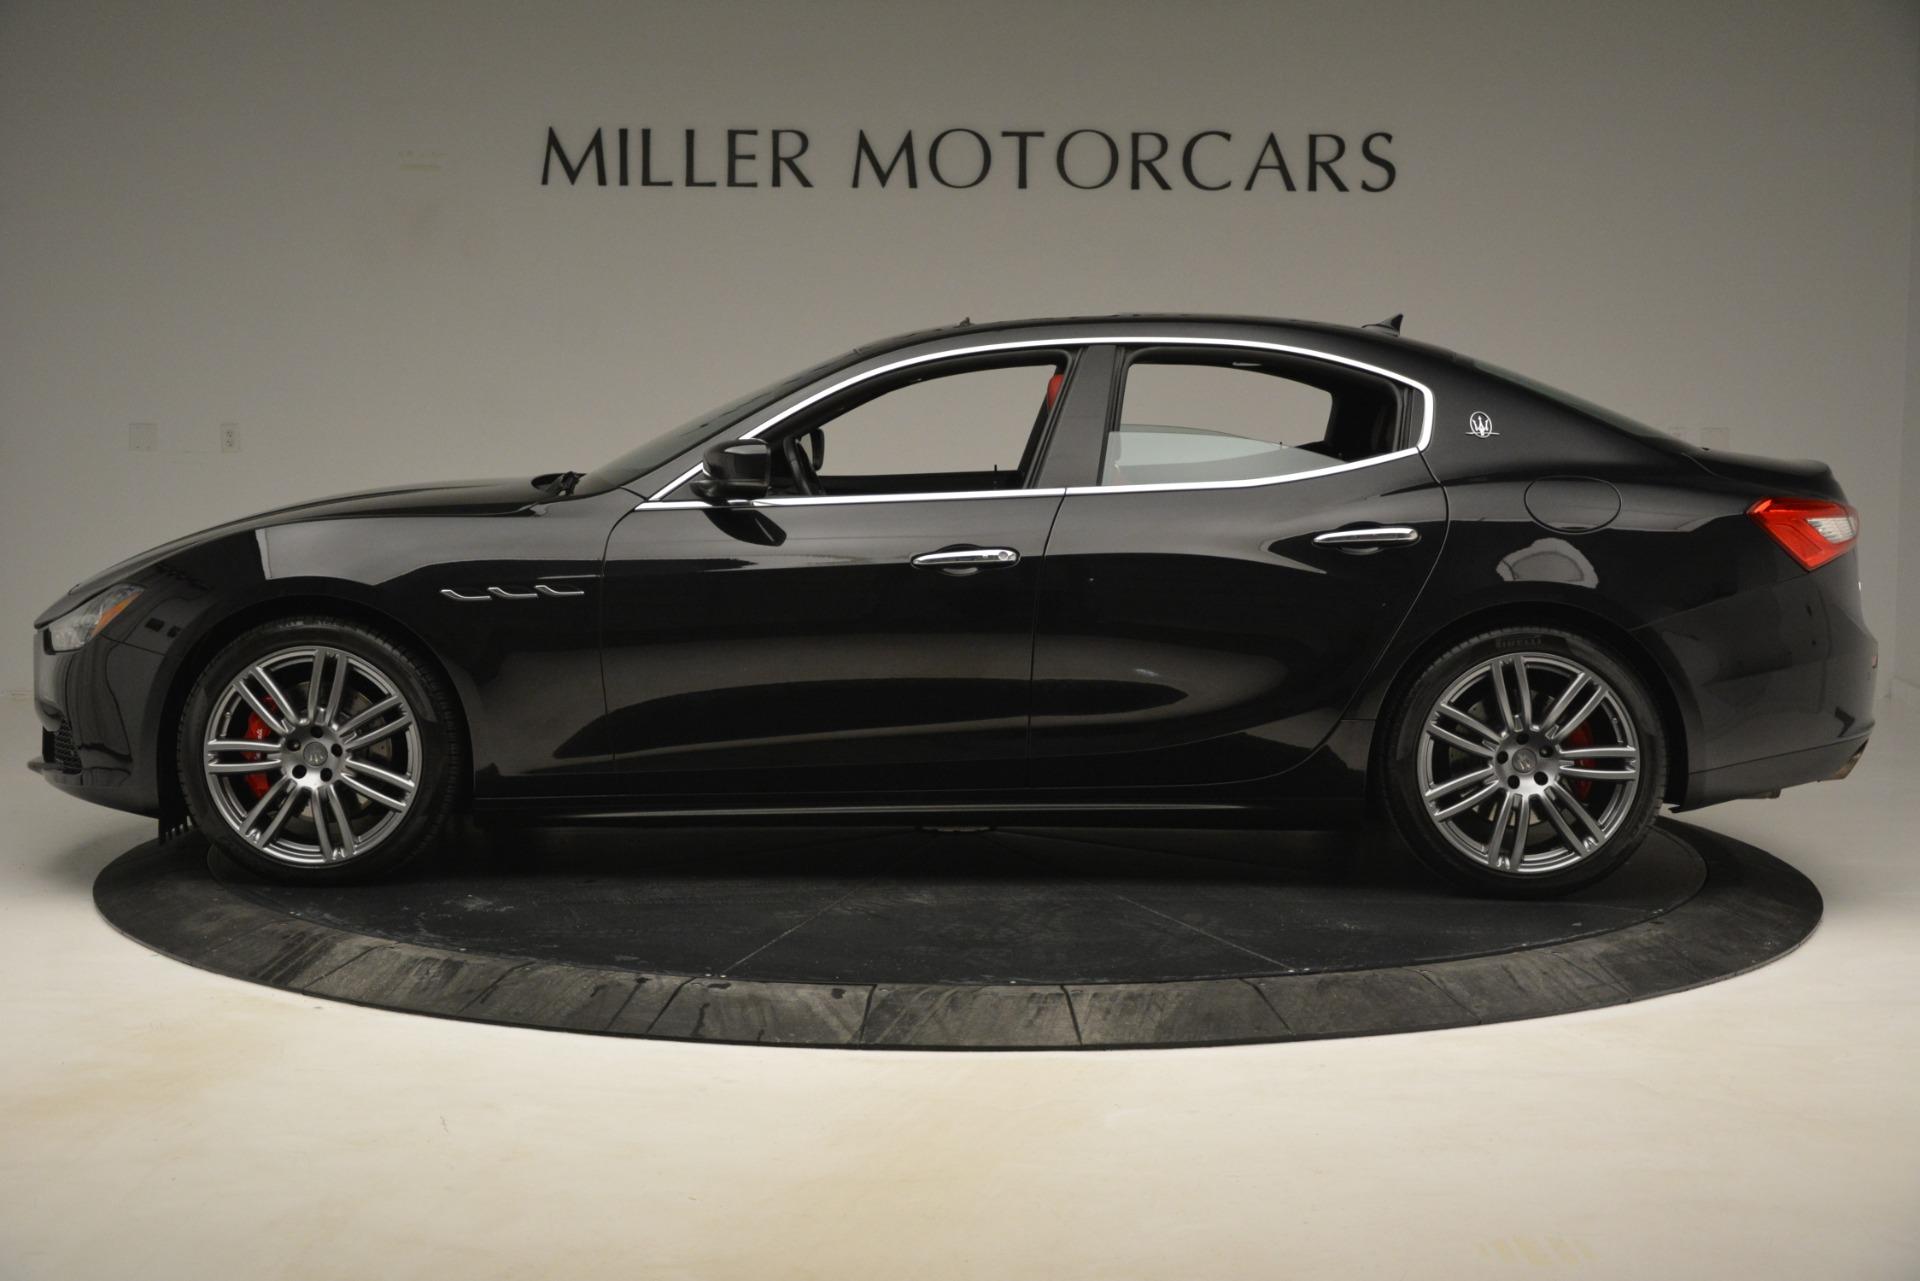 Used 2016 Maserati Ghibli S Q4 For Sale In Westport, CT 2945_p4